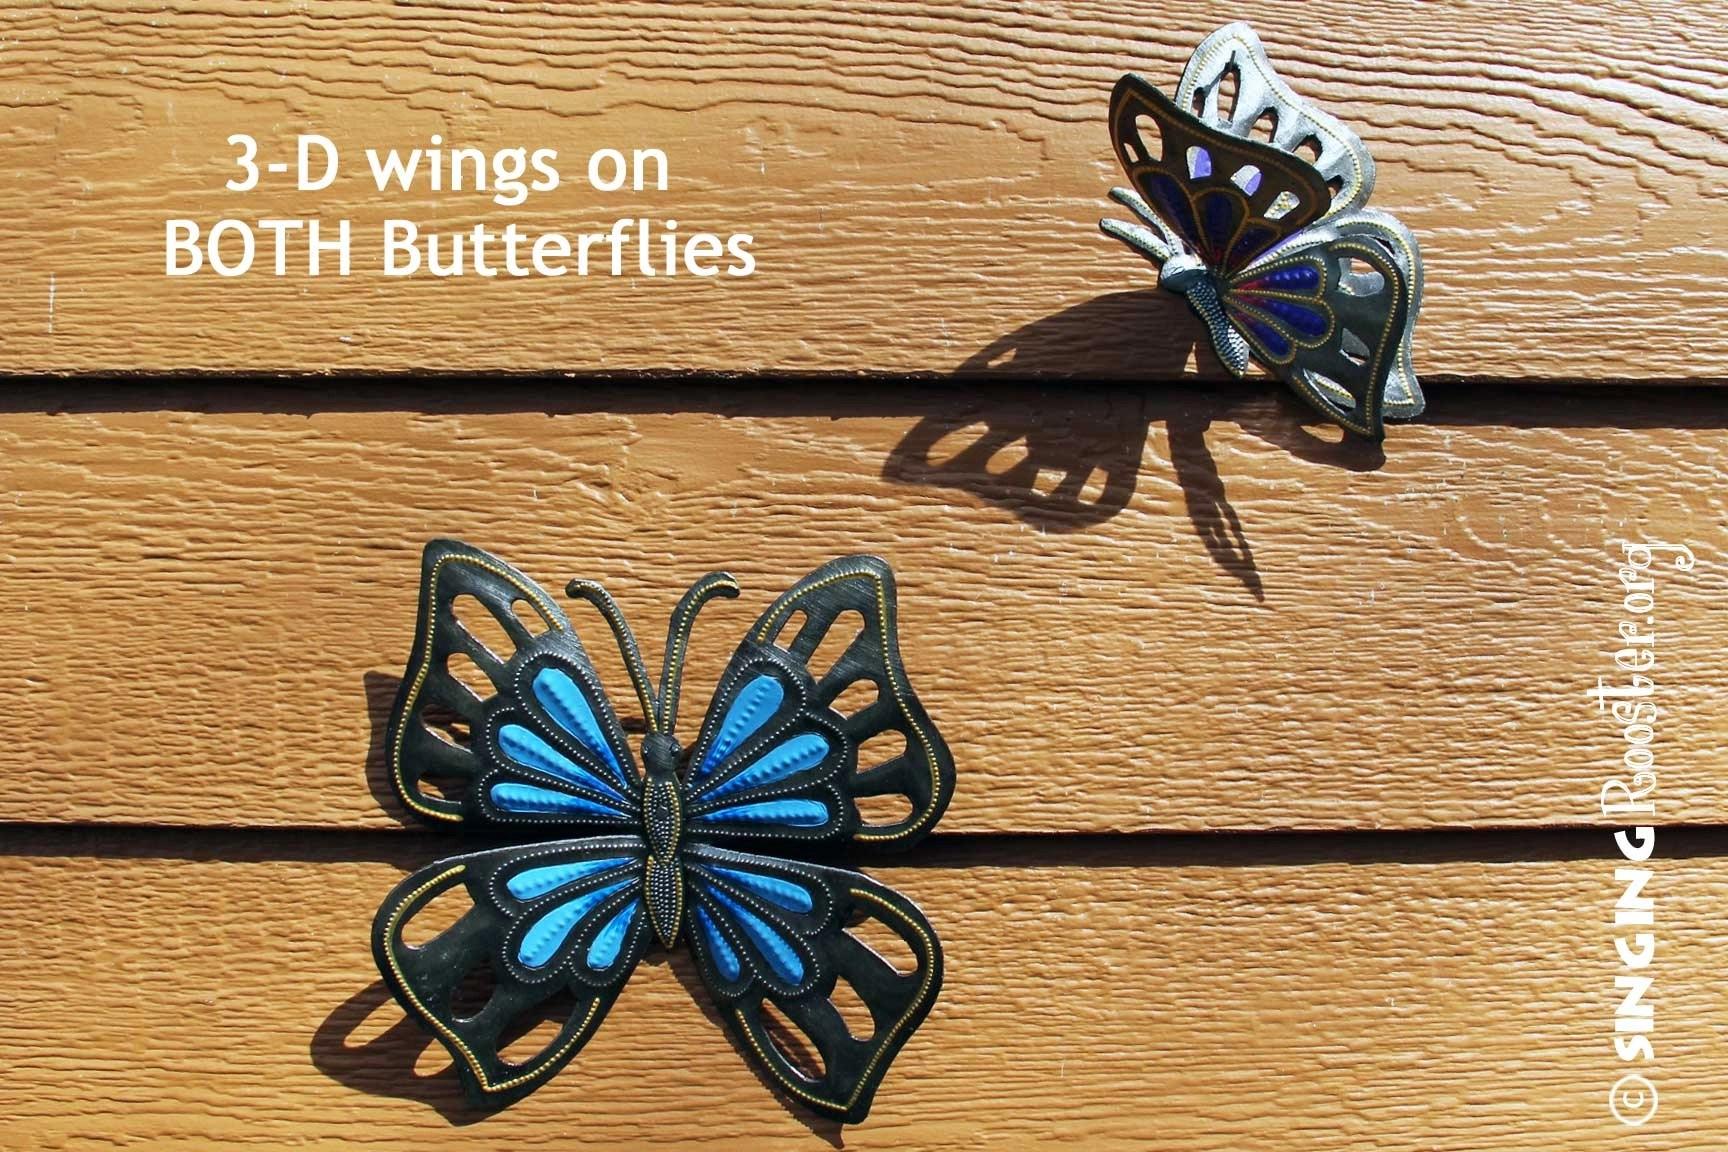 shop butterfly wall art online fair trade handmade in haiti. Black Bedroom Furniture Sets. Home Design Ideas